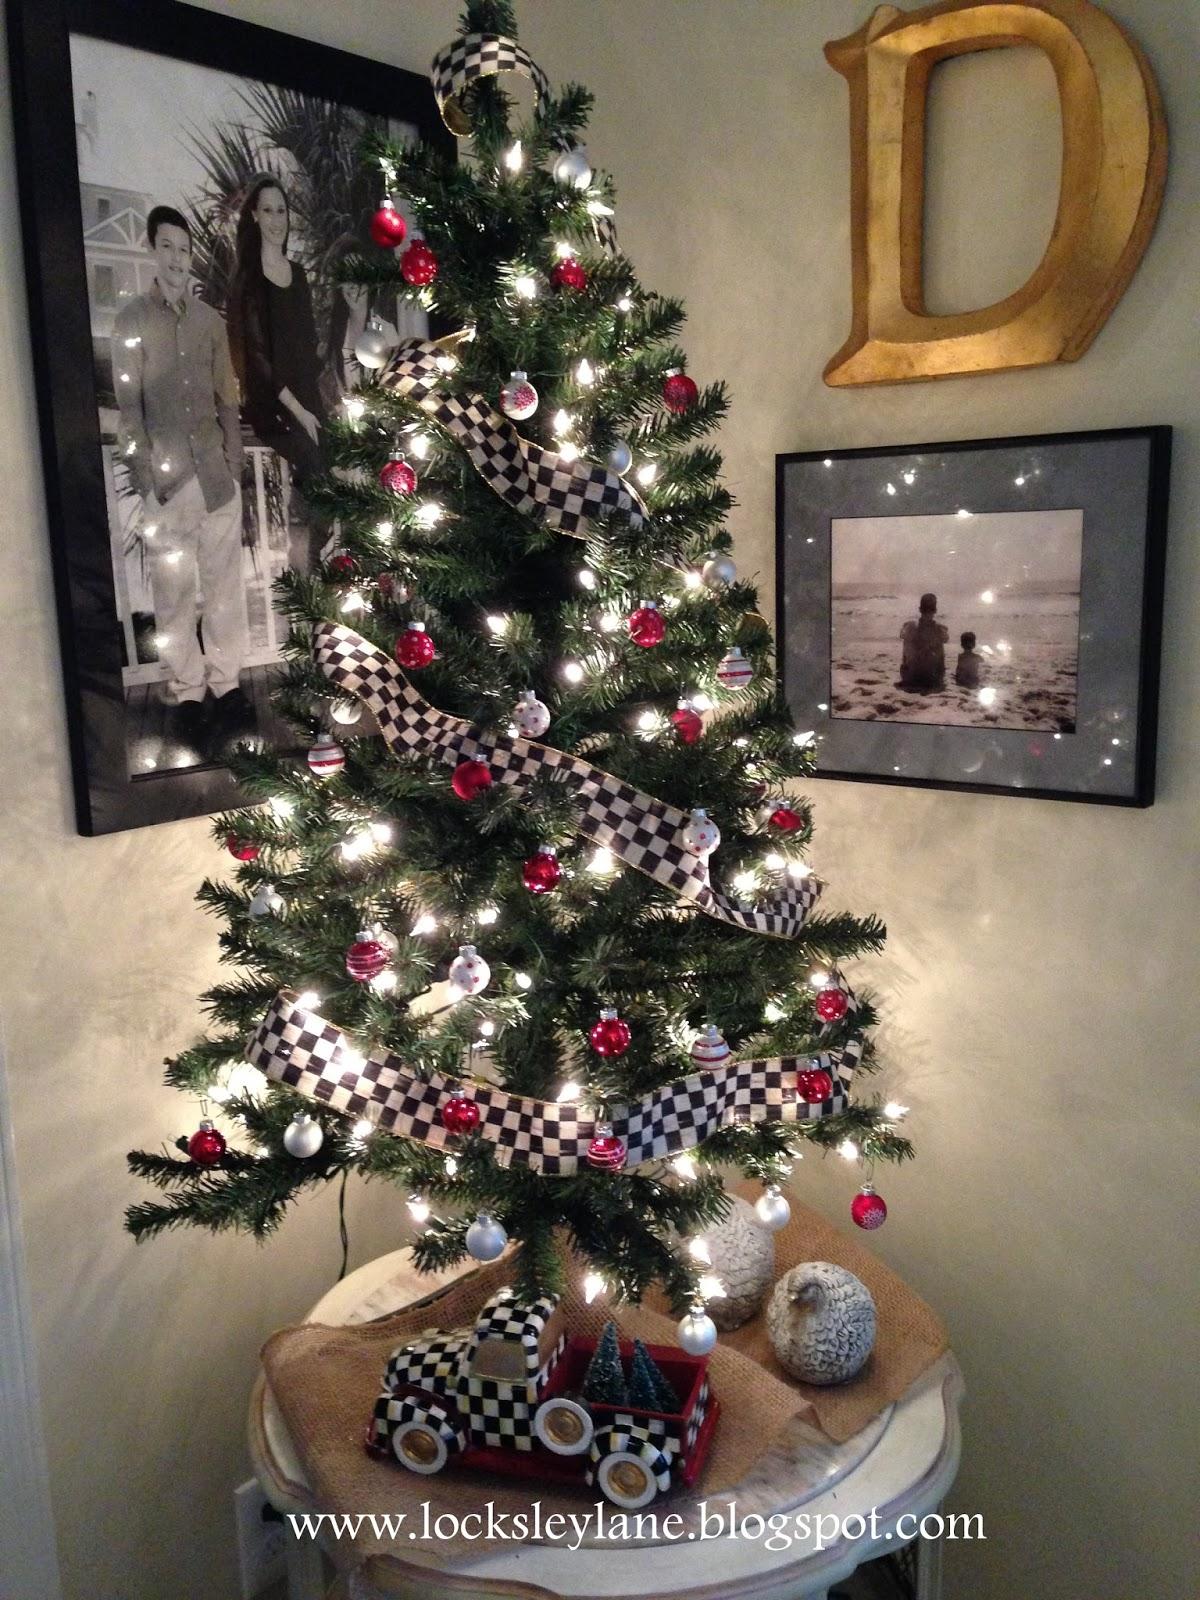 Locksley Lane: Mackenzie-Childs' Christmas Truck - Paint Your Own